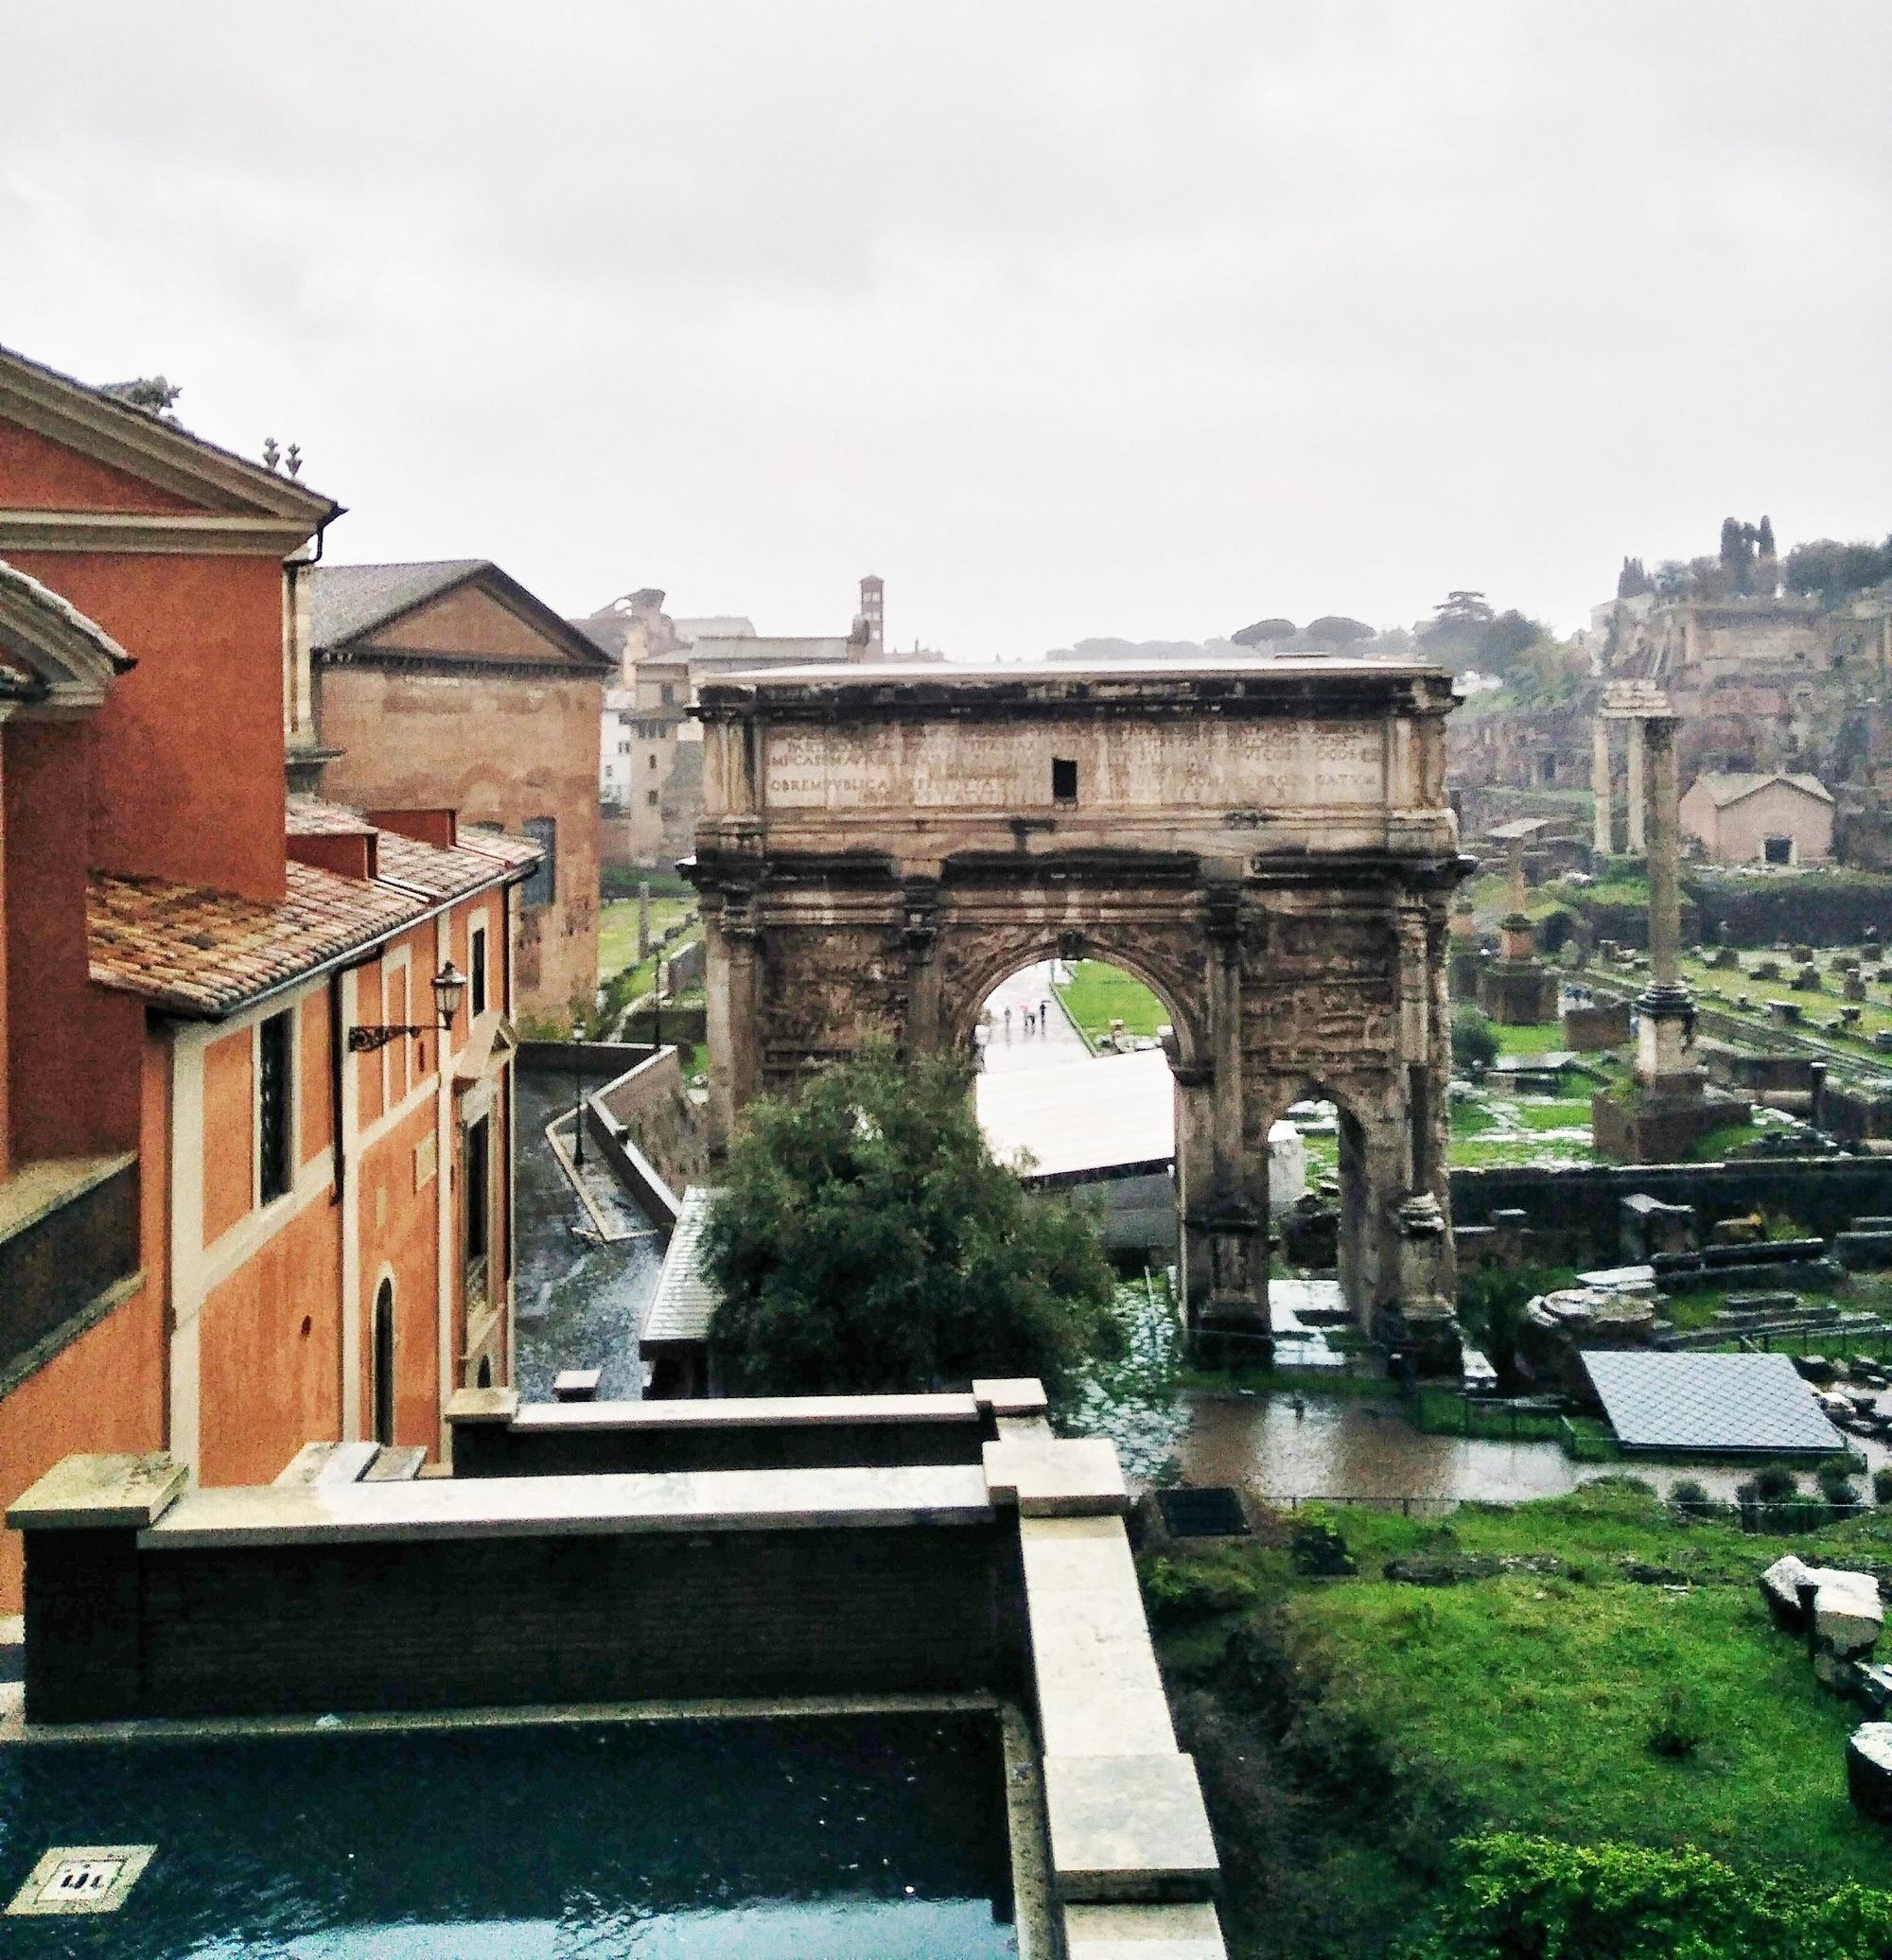 Рим: взгляд на Вечный город под другим углом Рим: взгляд на Вечный город под другим углом IMG 20180409 153215 01